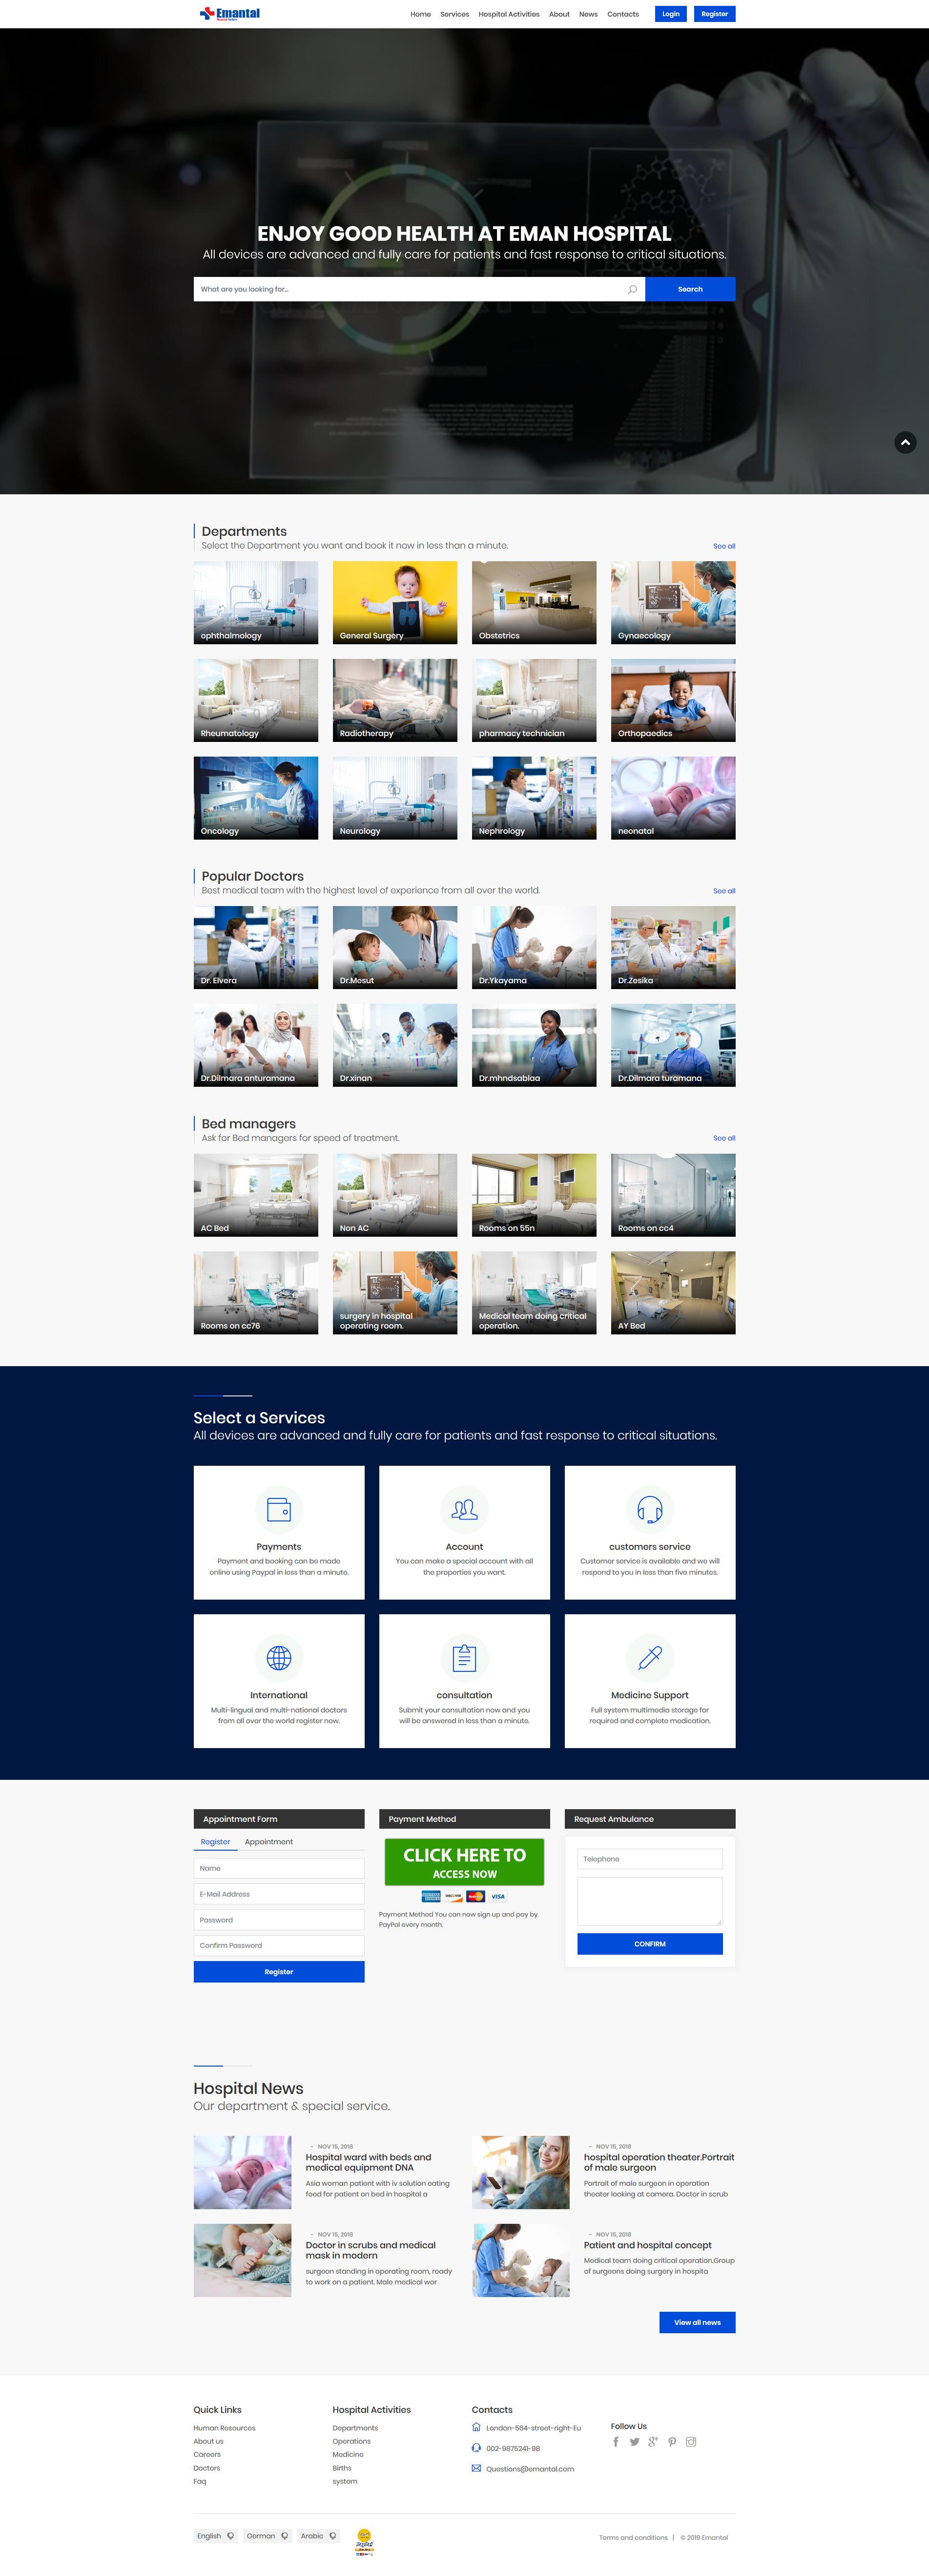 Emantals – Hospital Management System with Website